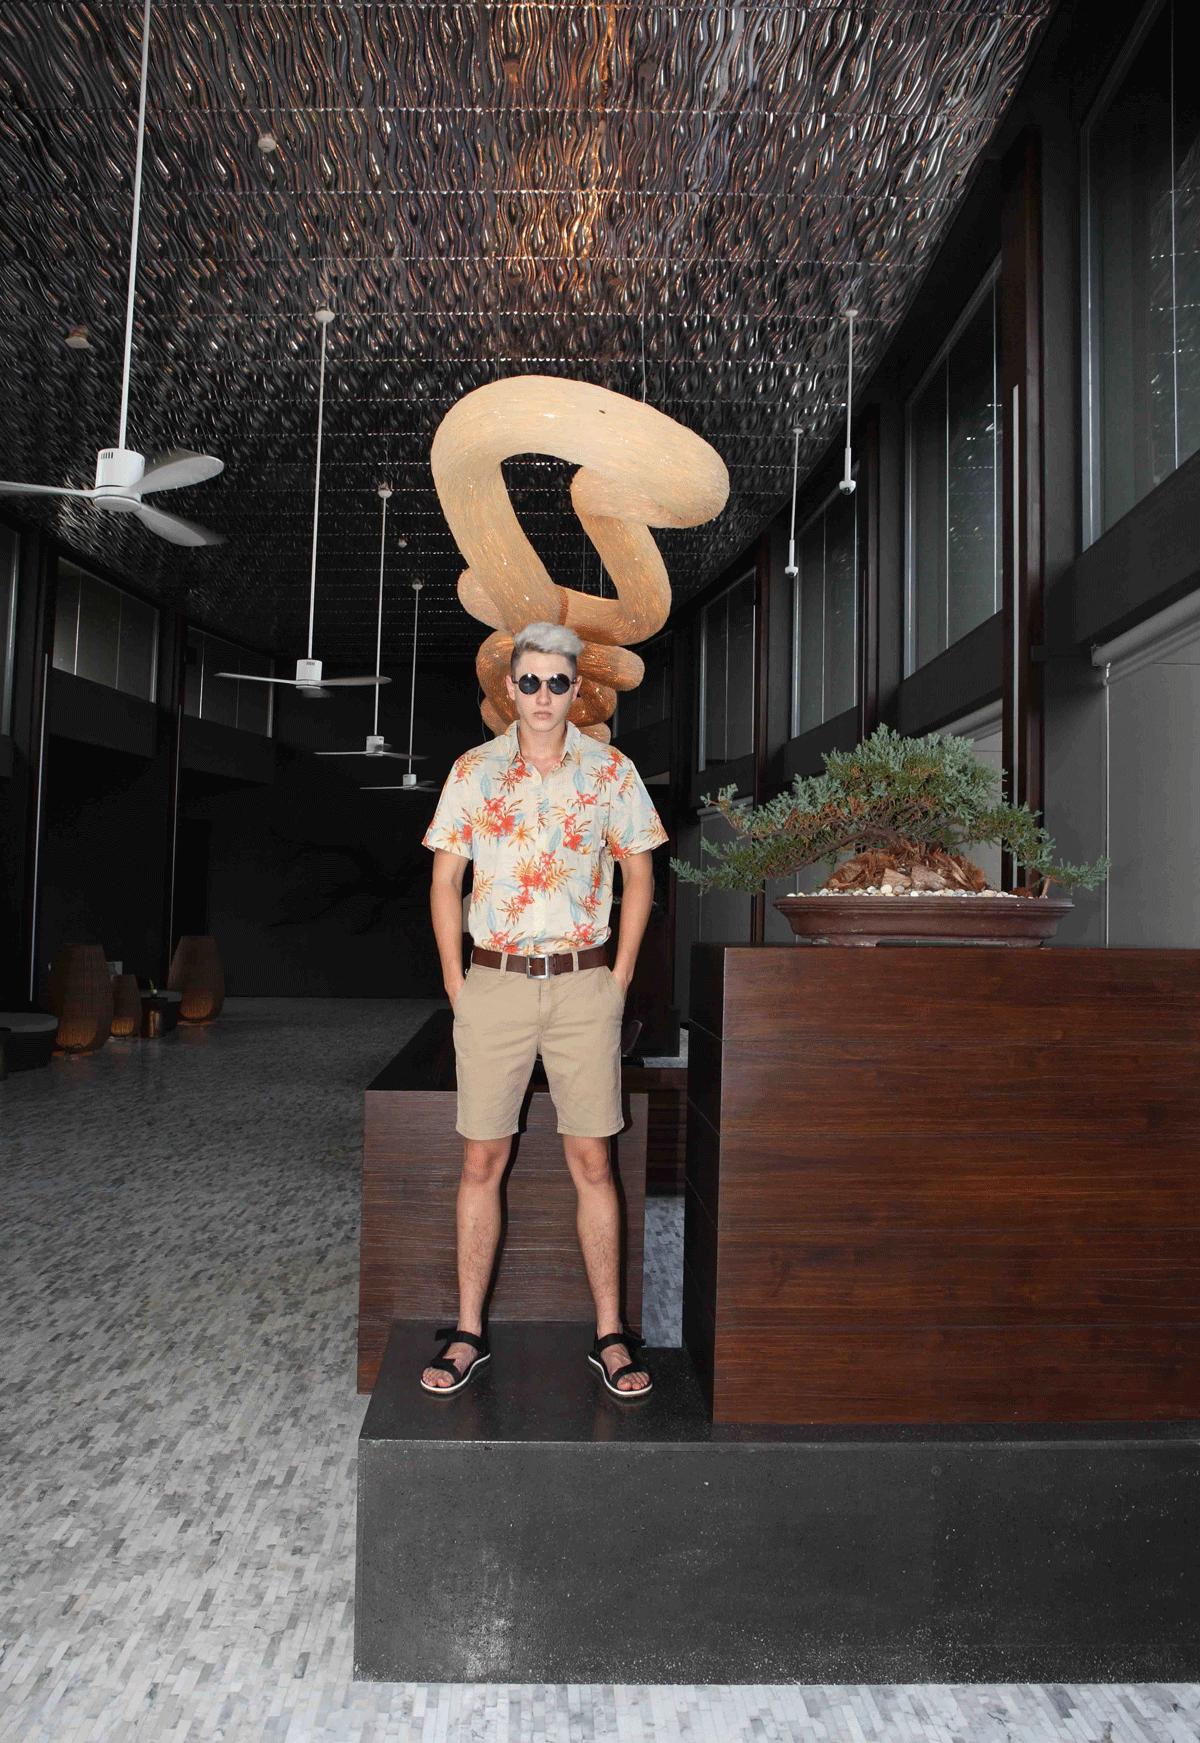 clothes : QUIKSILVER / sunglasses : TAVAT